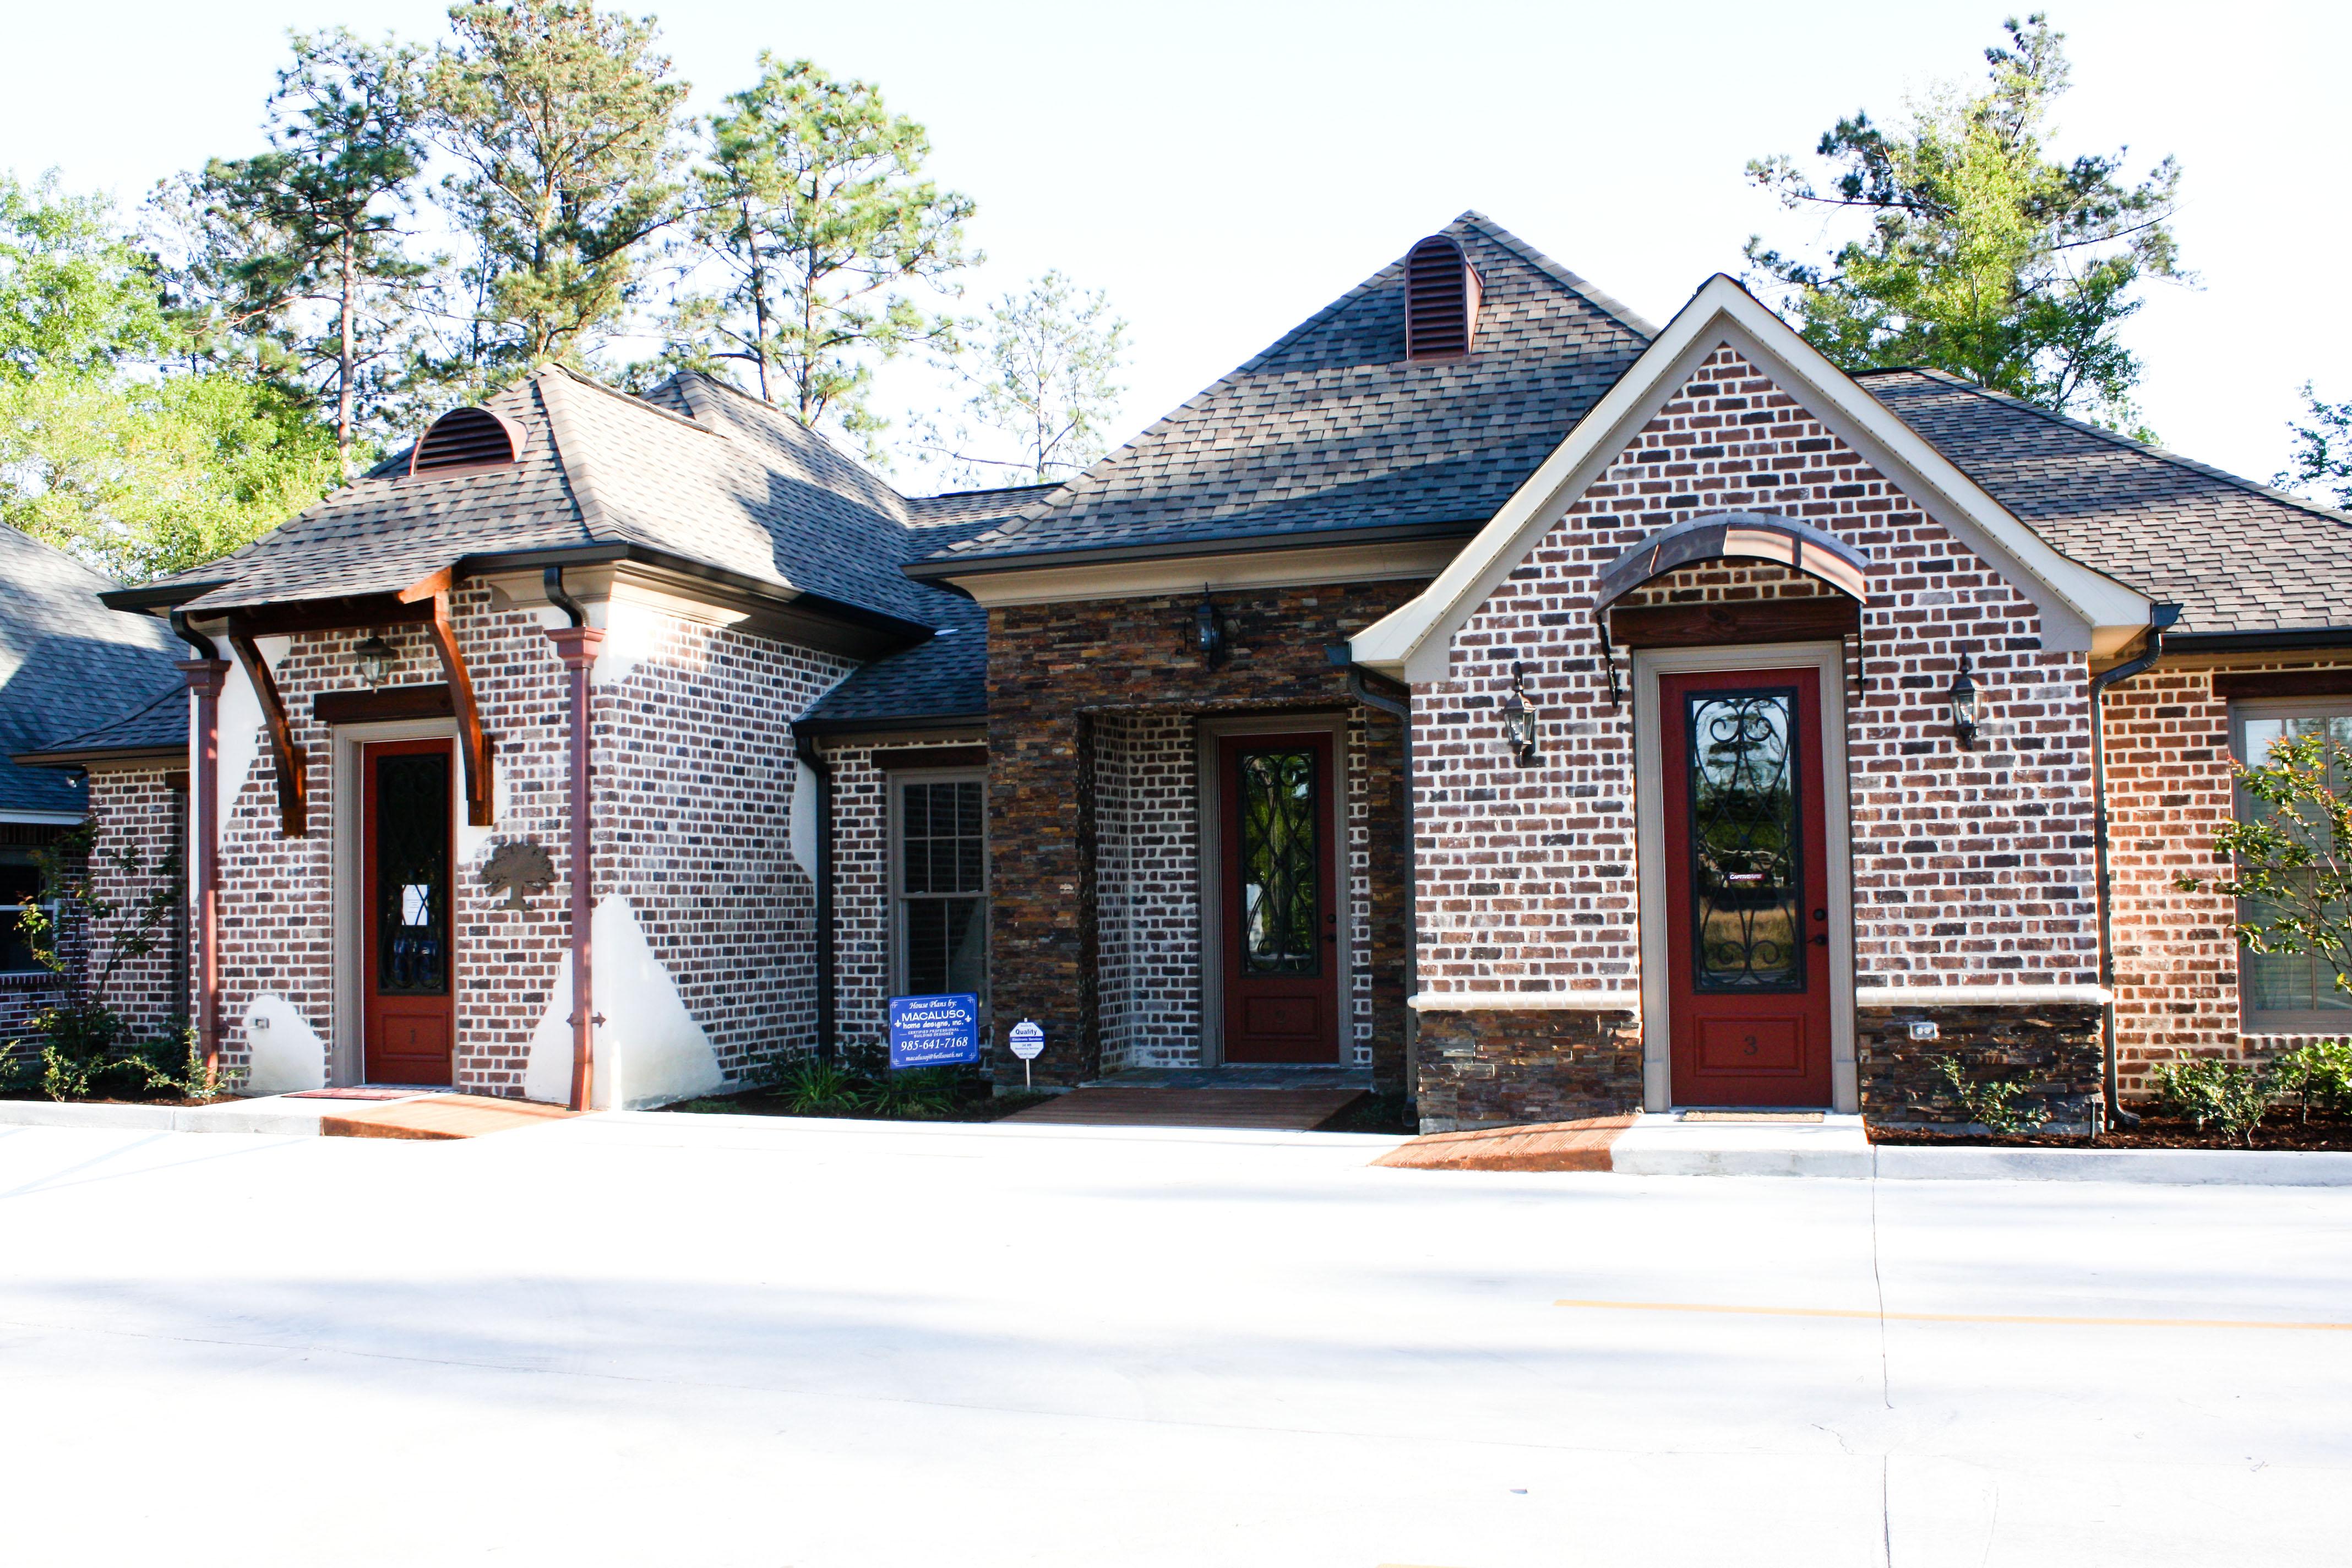 Village Centre I